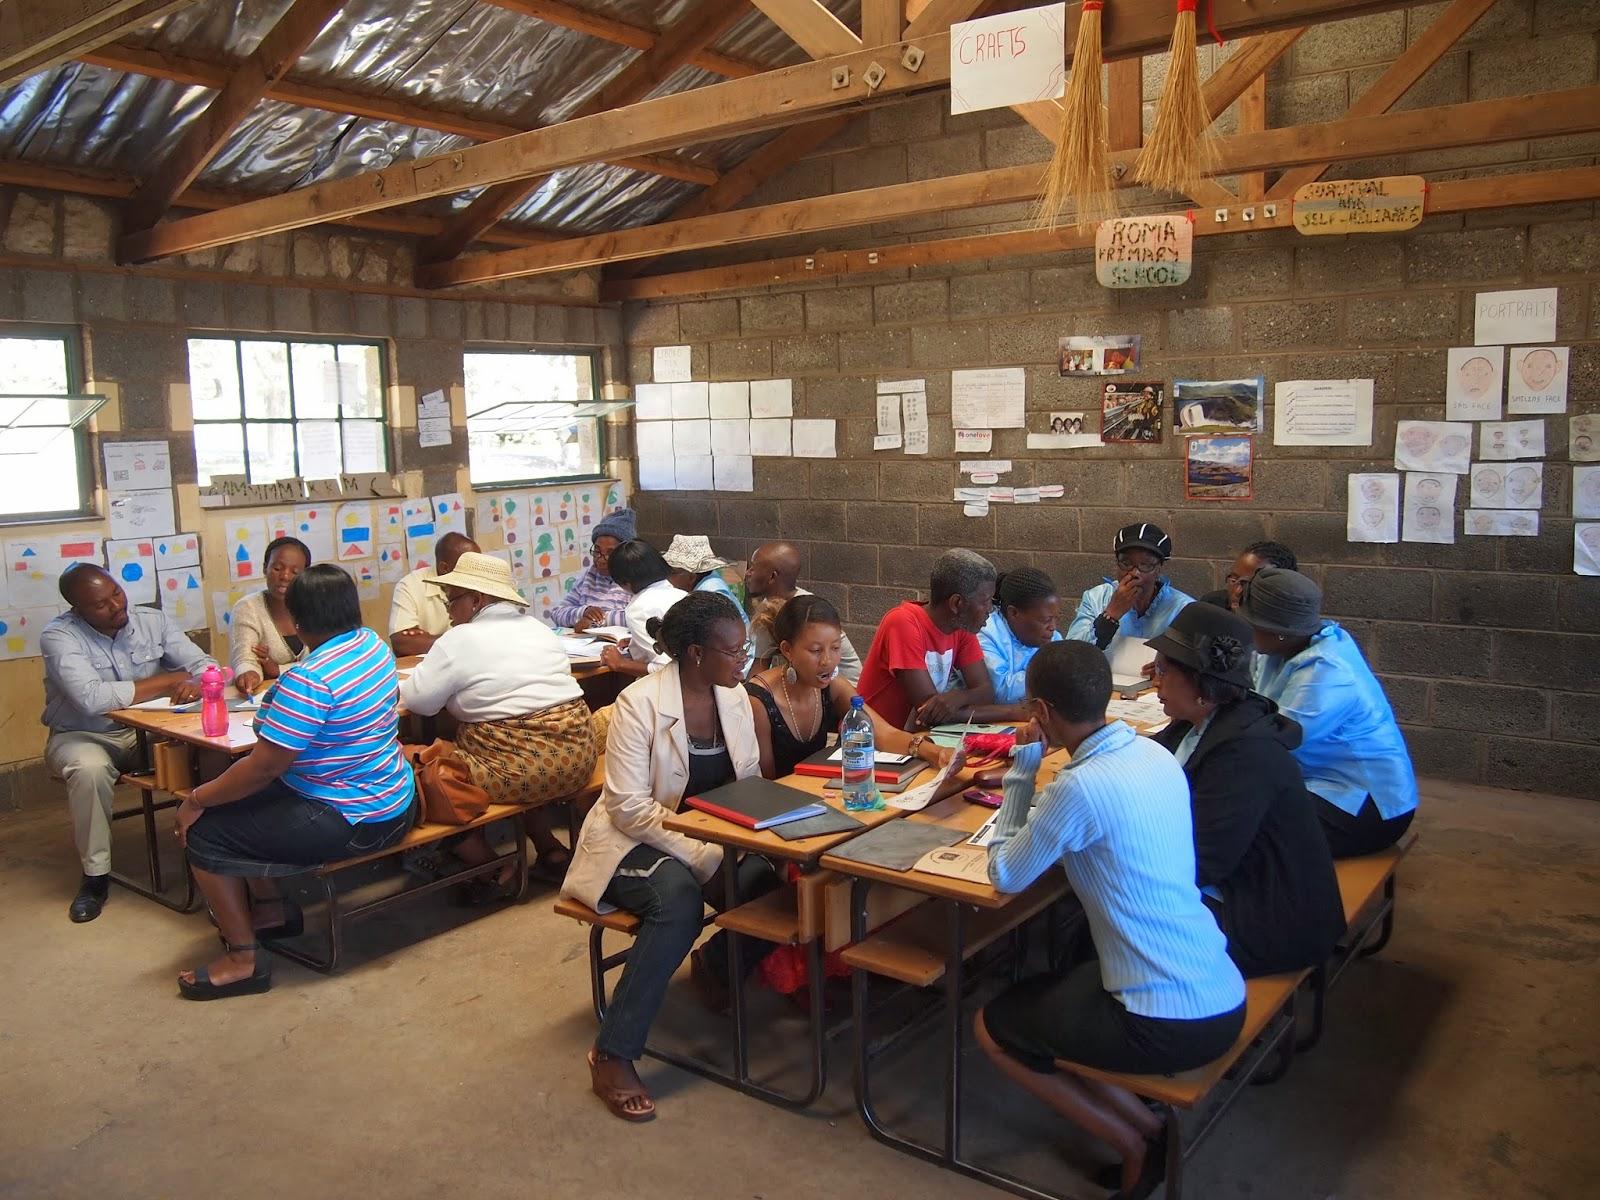 Kinder Garden: School Linking Blog: Roma Primary School Visit